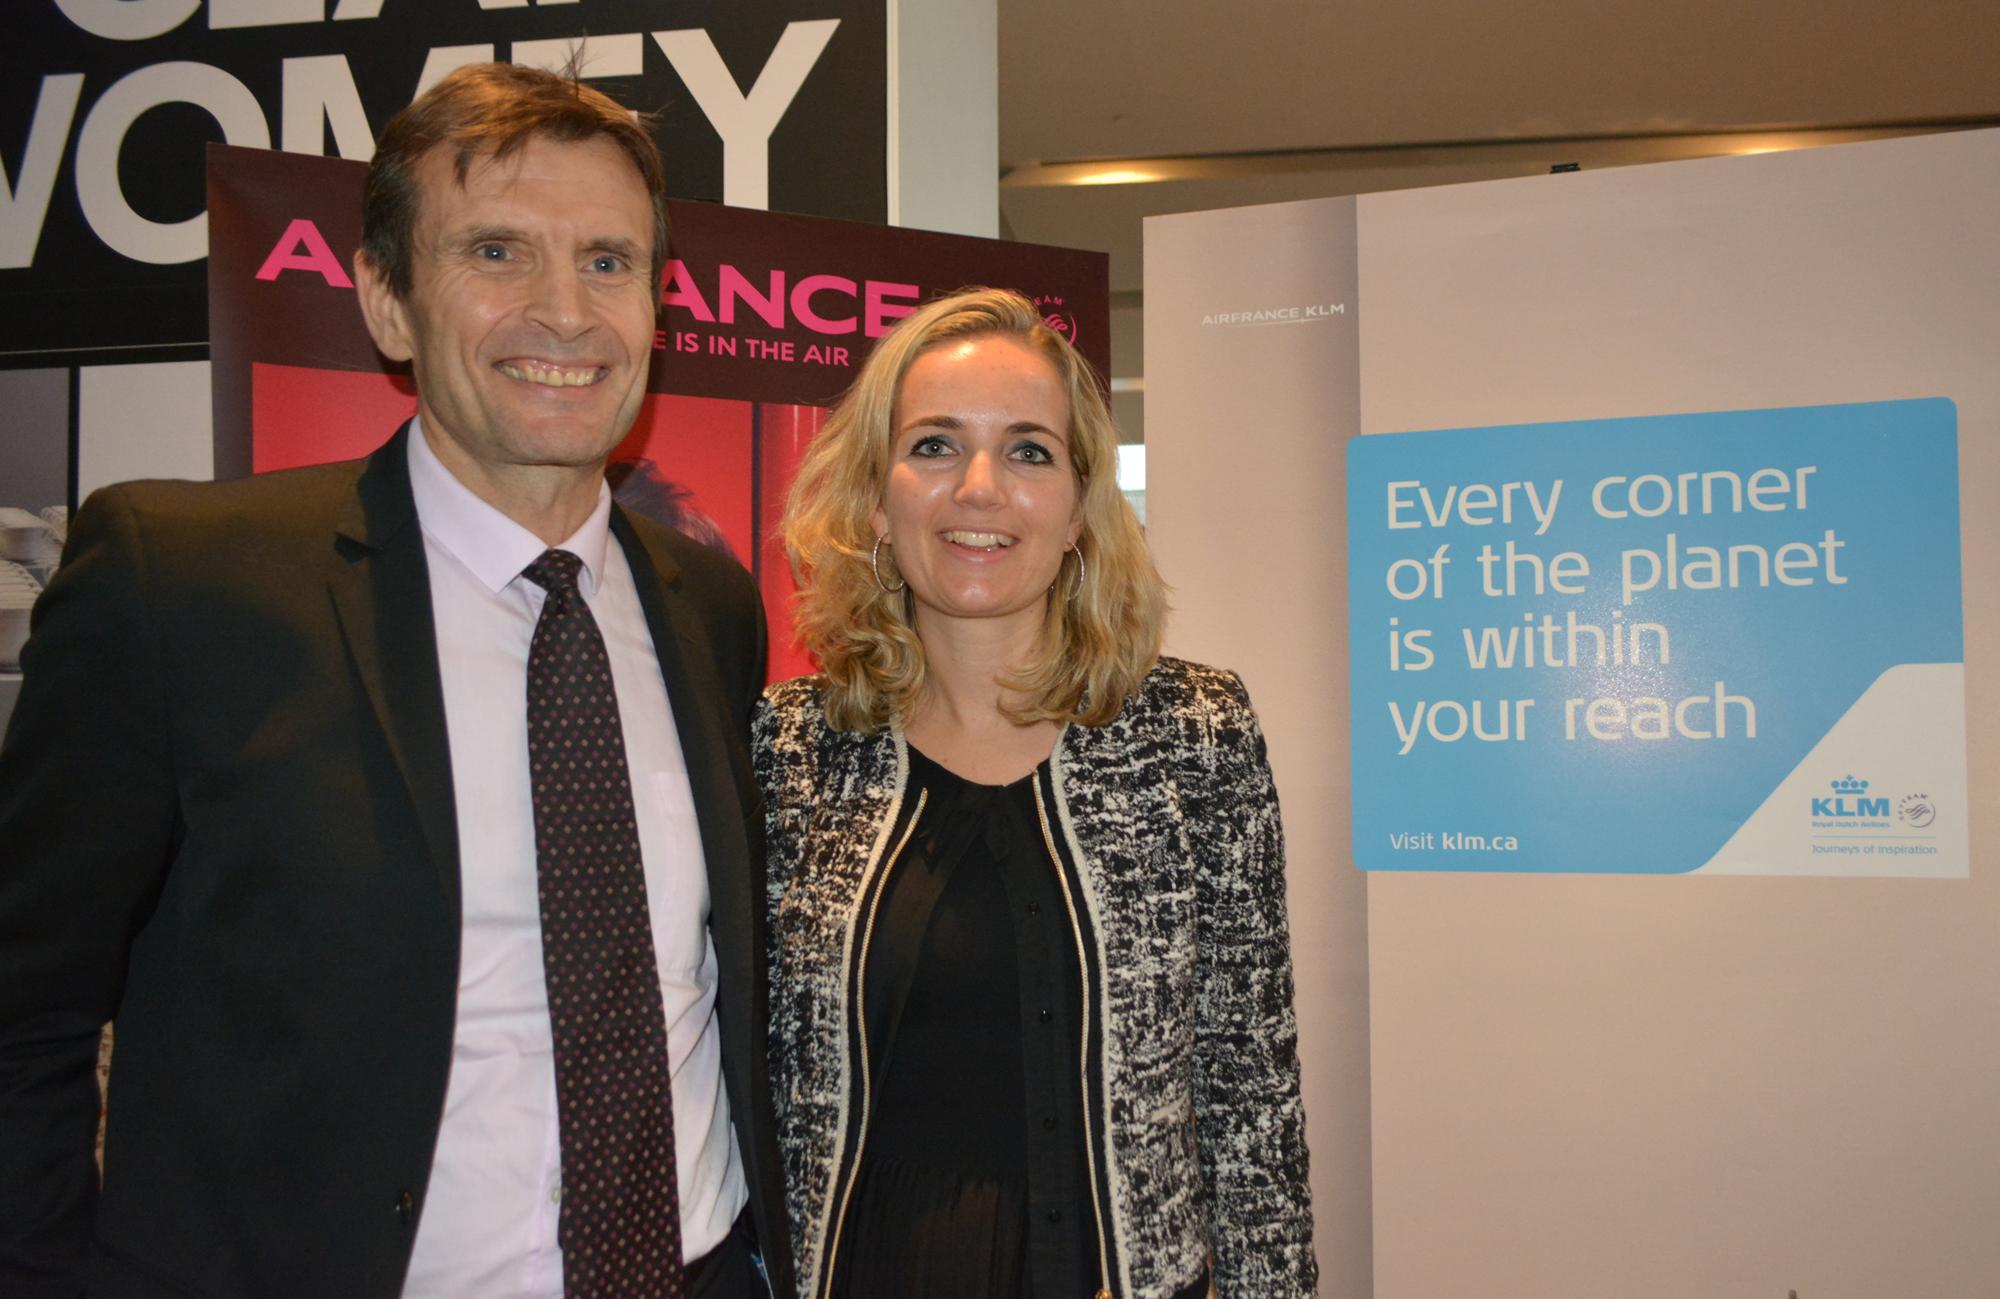 Air France, KLM celebrate milestones